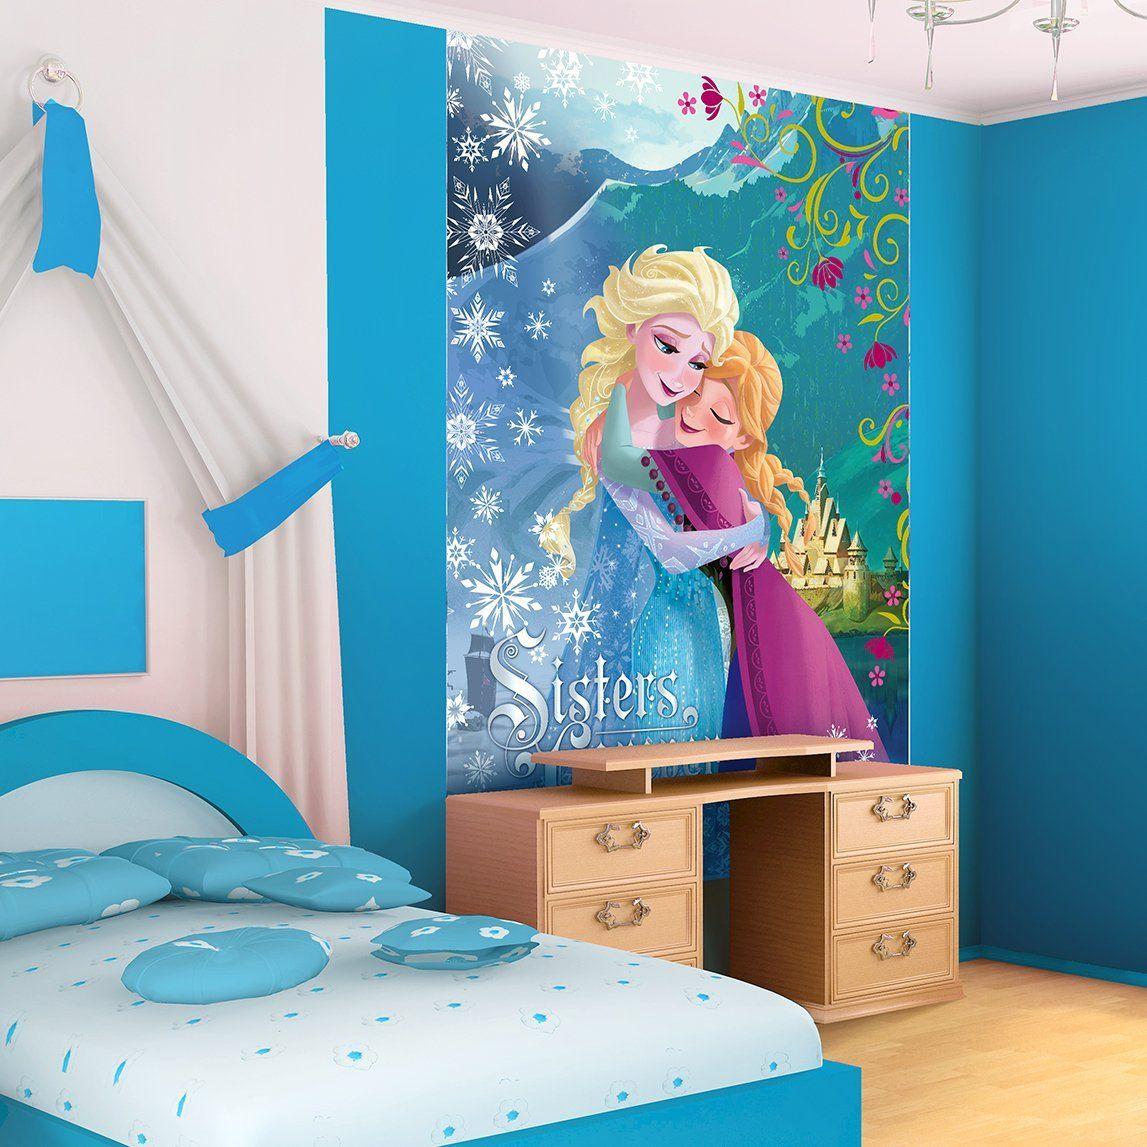 Disney frozen wall stencils - Disney Frozen Anna And Elsa Sisters Wallpaper Mural Amazon Com